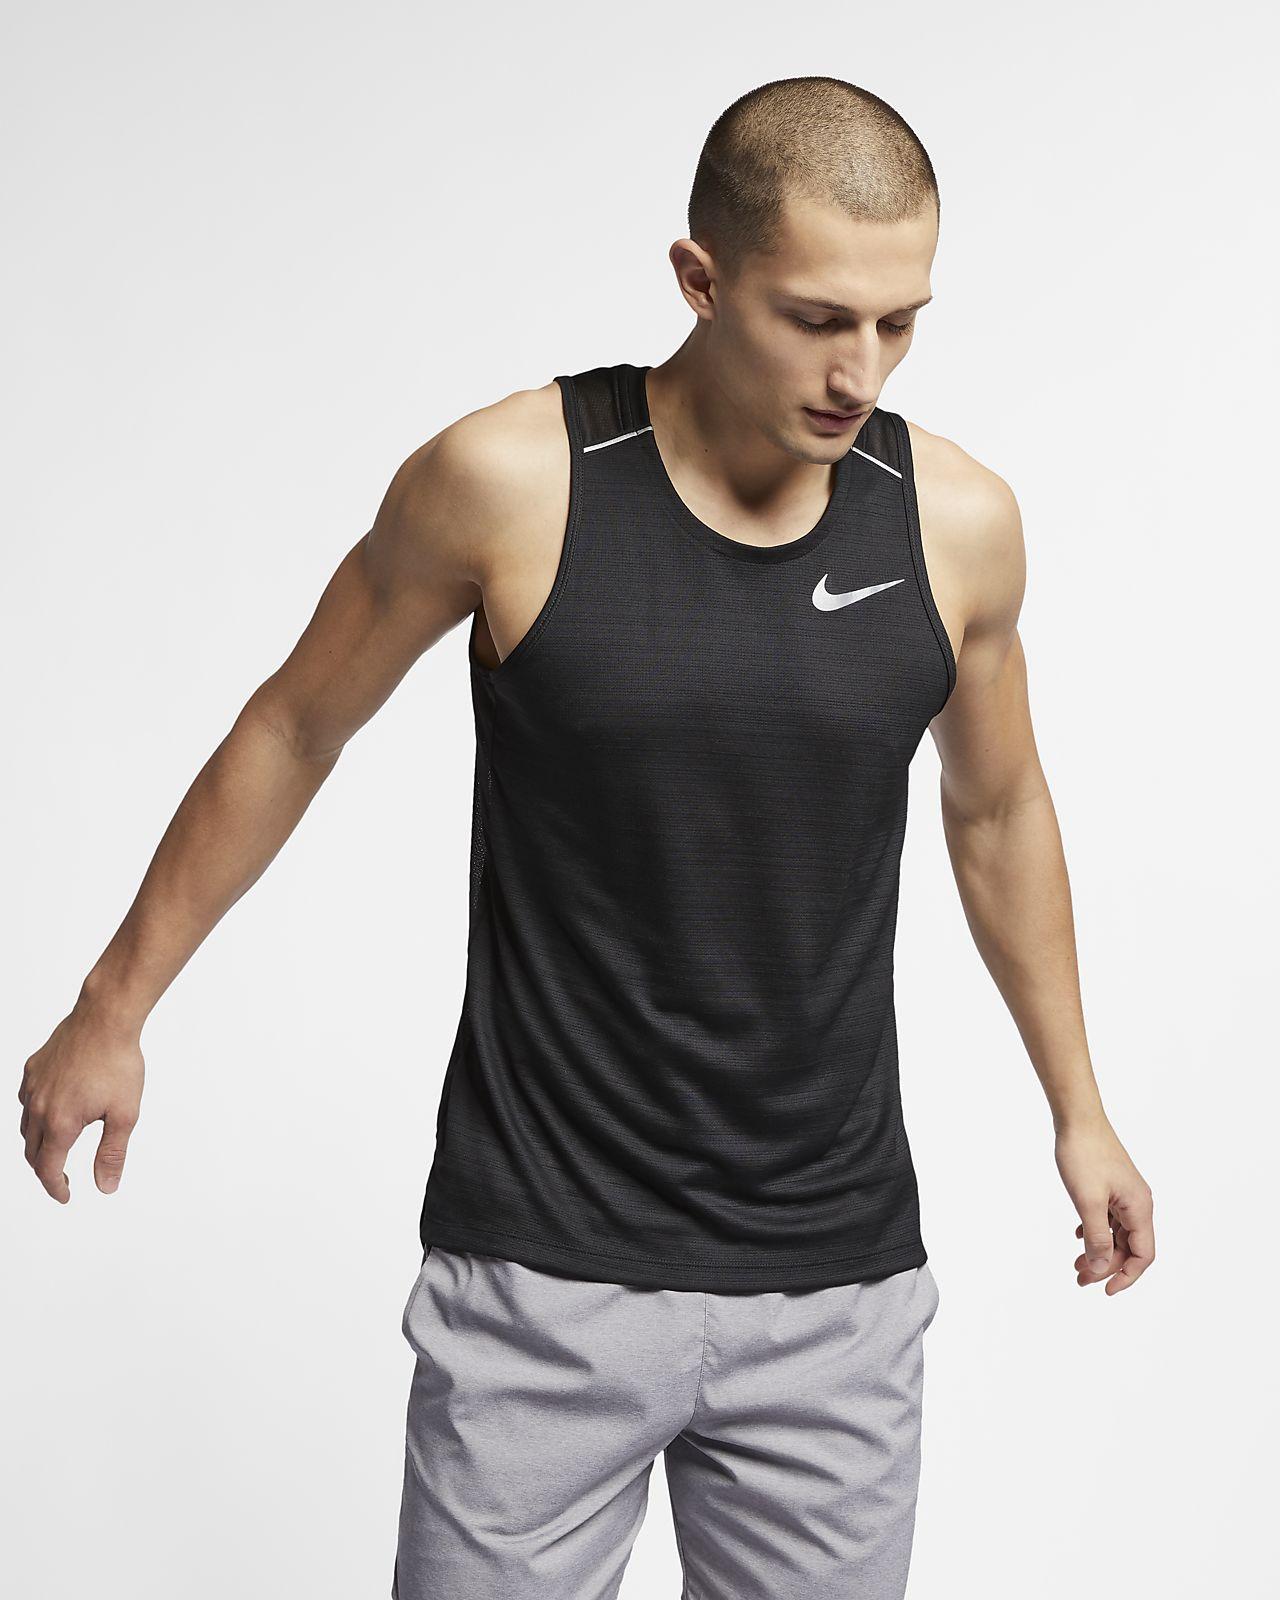 Camisola de running sem mangas Nike Dri-FIT Miller para homem